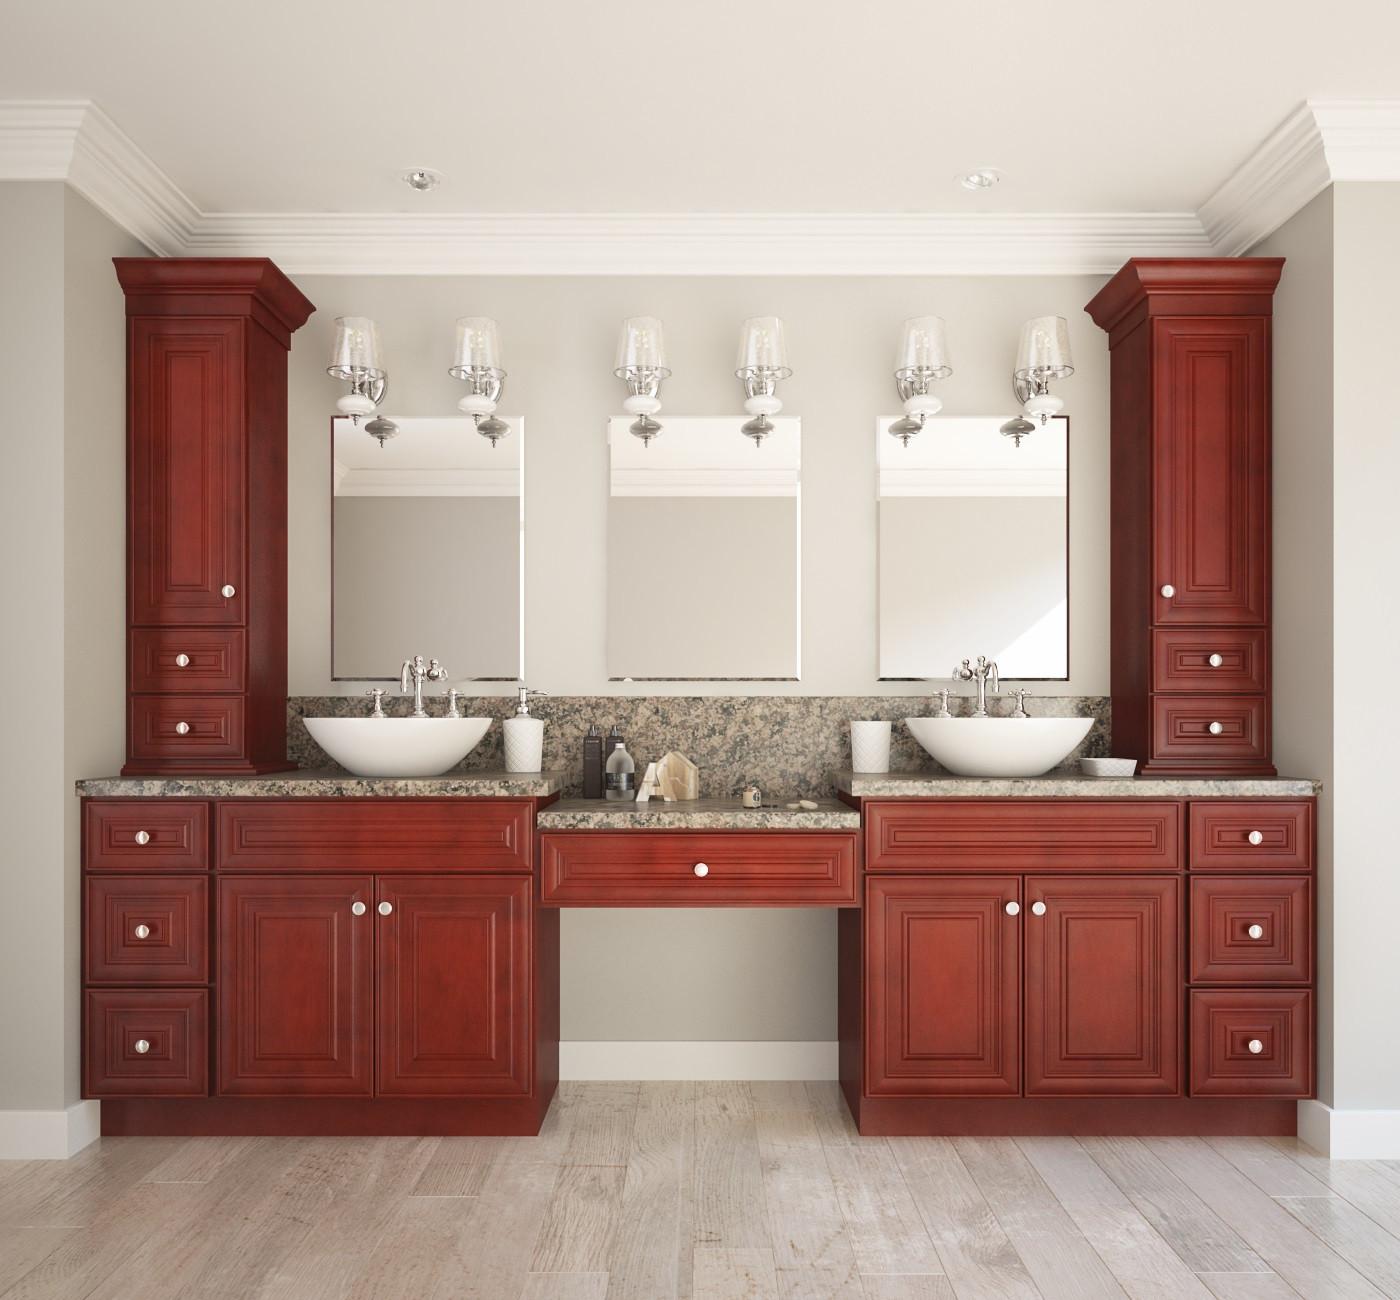 Cabinets To Go Bathroom Vanity  Cayenne Cognac Ready to Assemble Bathroom Vanities